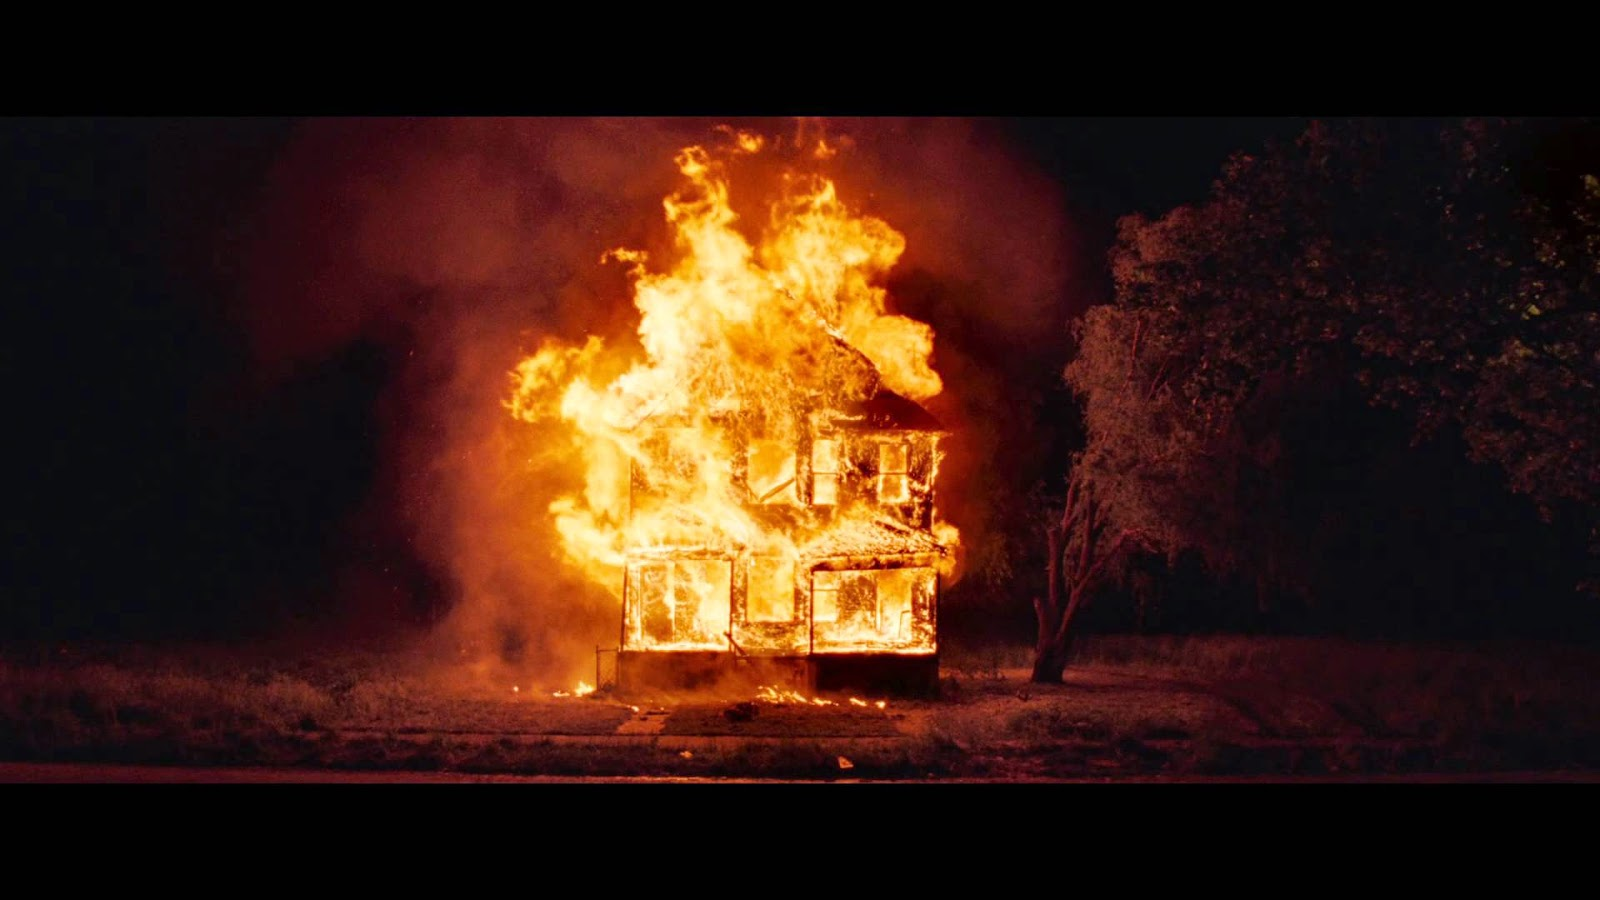 Maison en feu dans Lost River, de Ryan Gosling (2015)